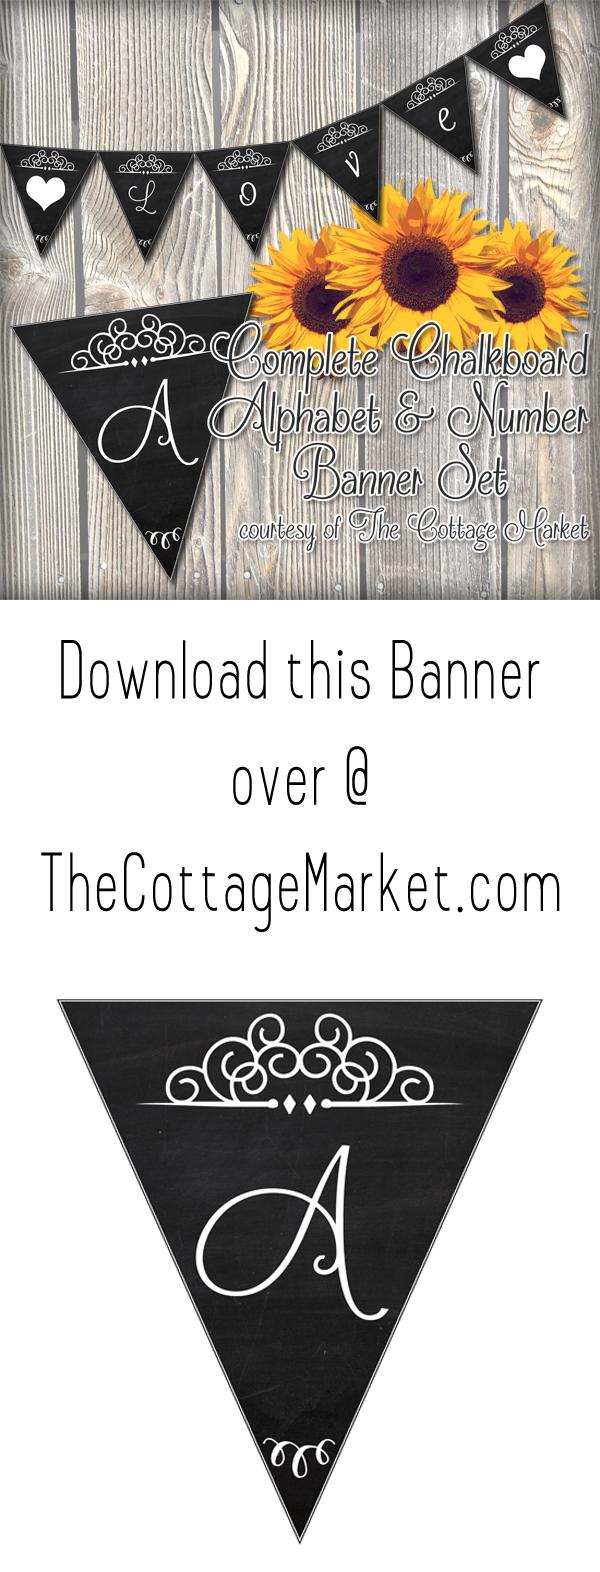 TheCottageMarket-ChalkboardBanner-Tower